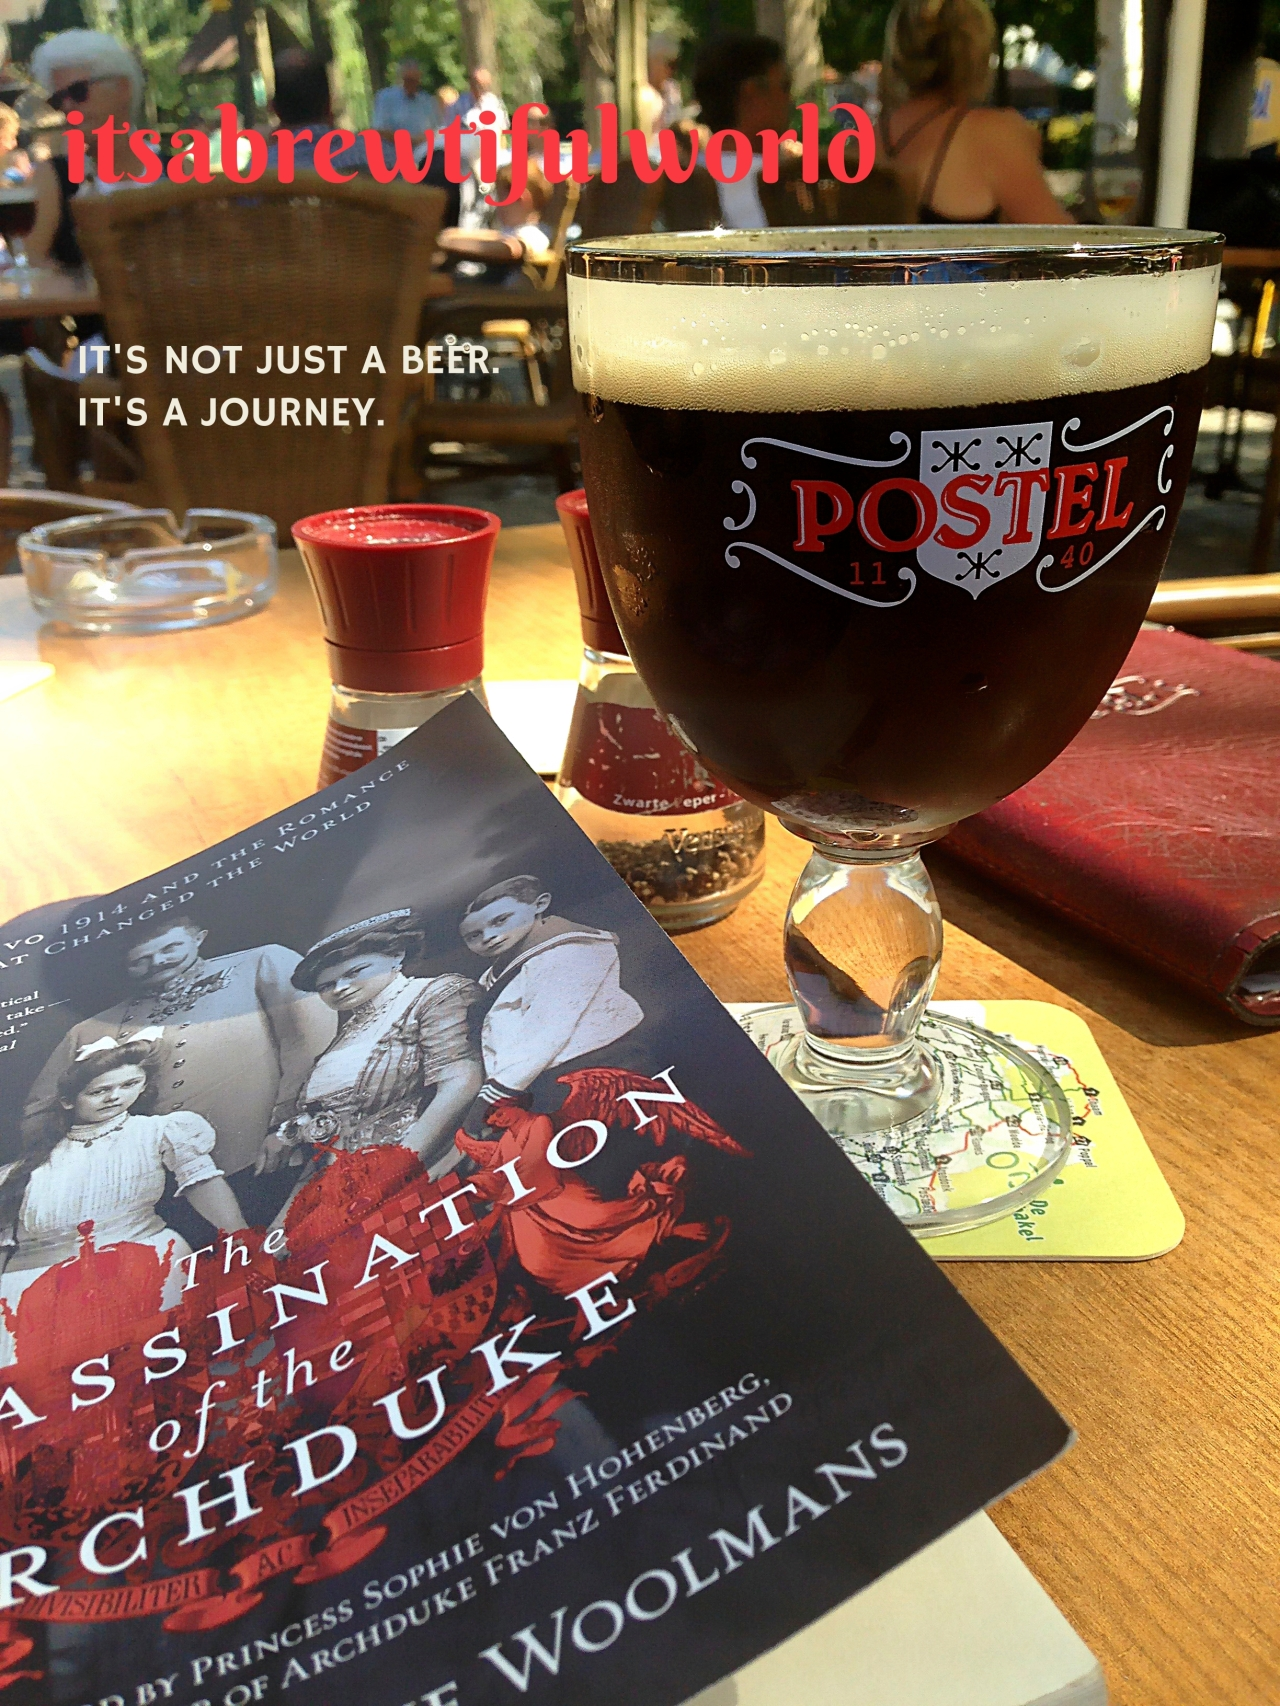 Beer & Bike:  Postel &Corsendonk